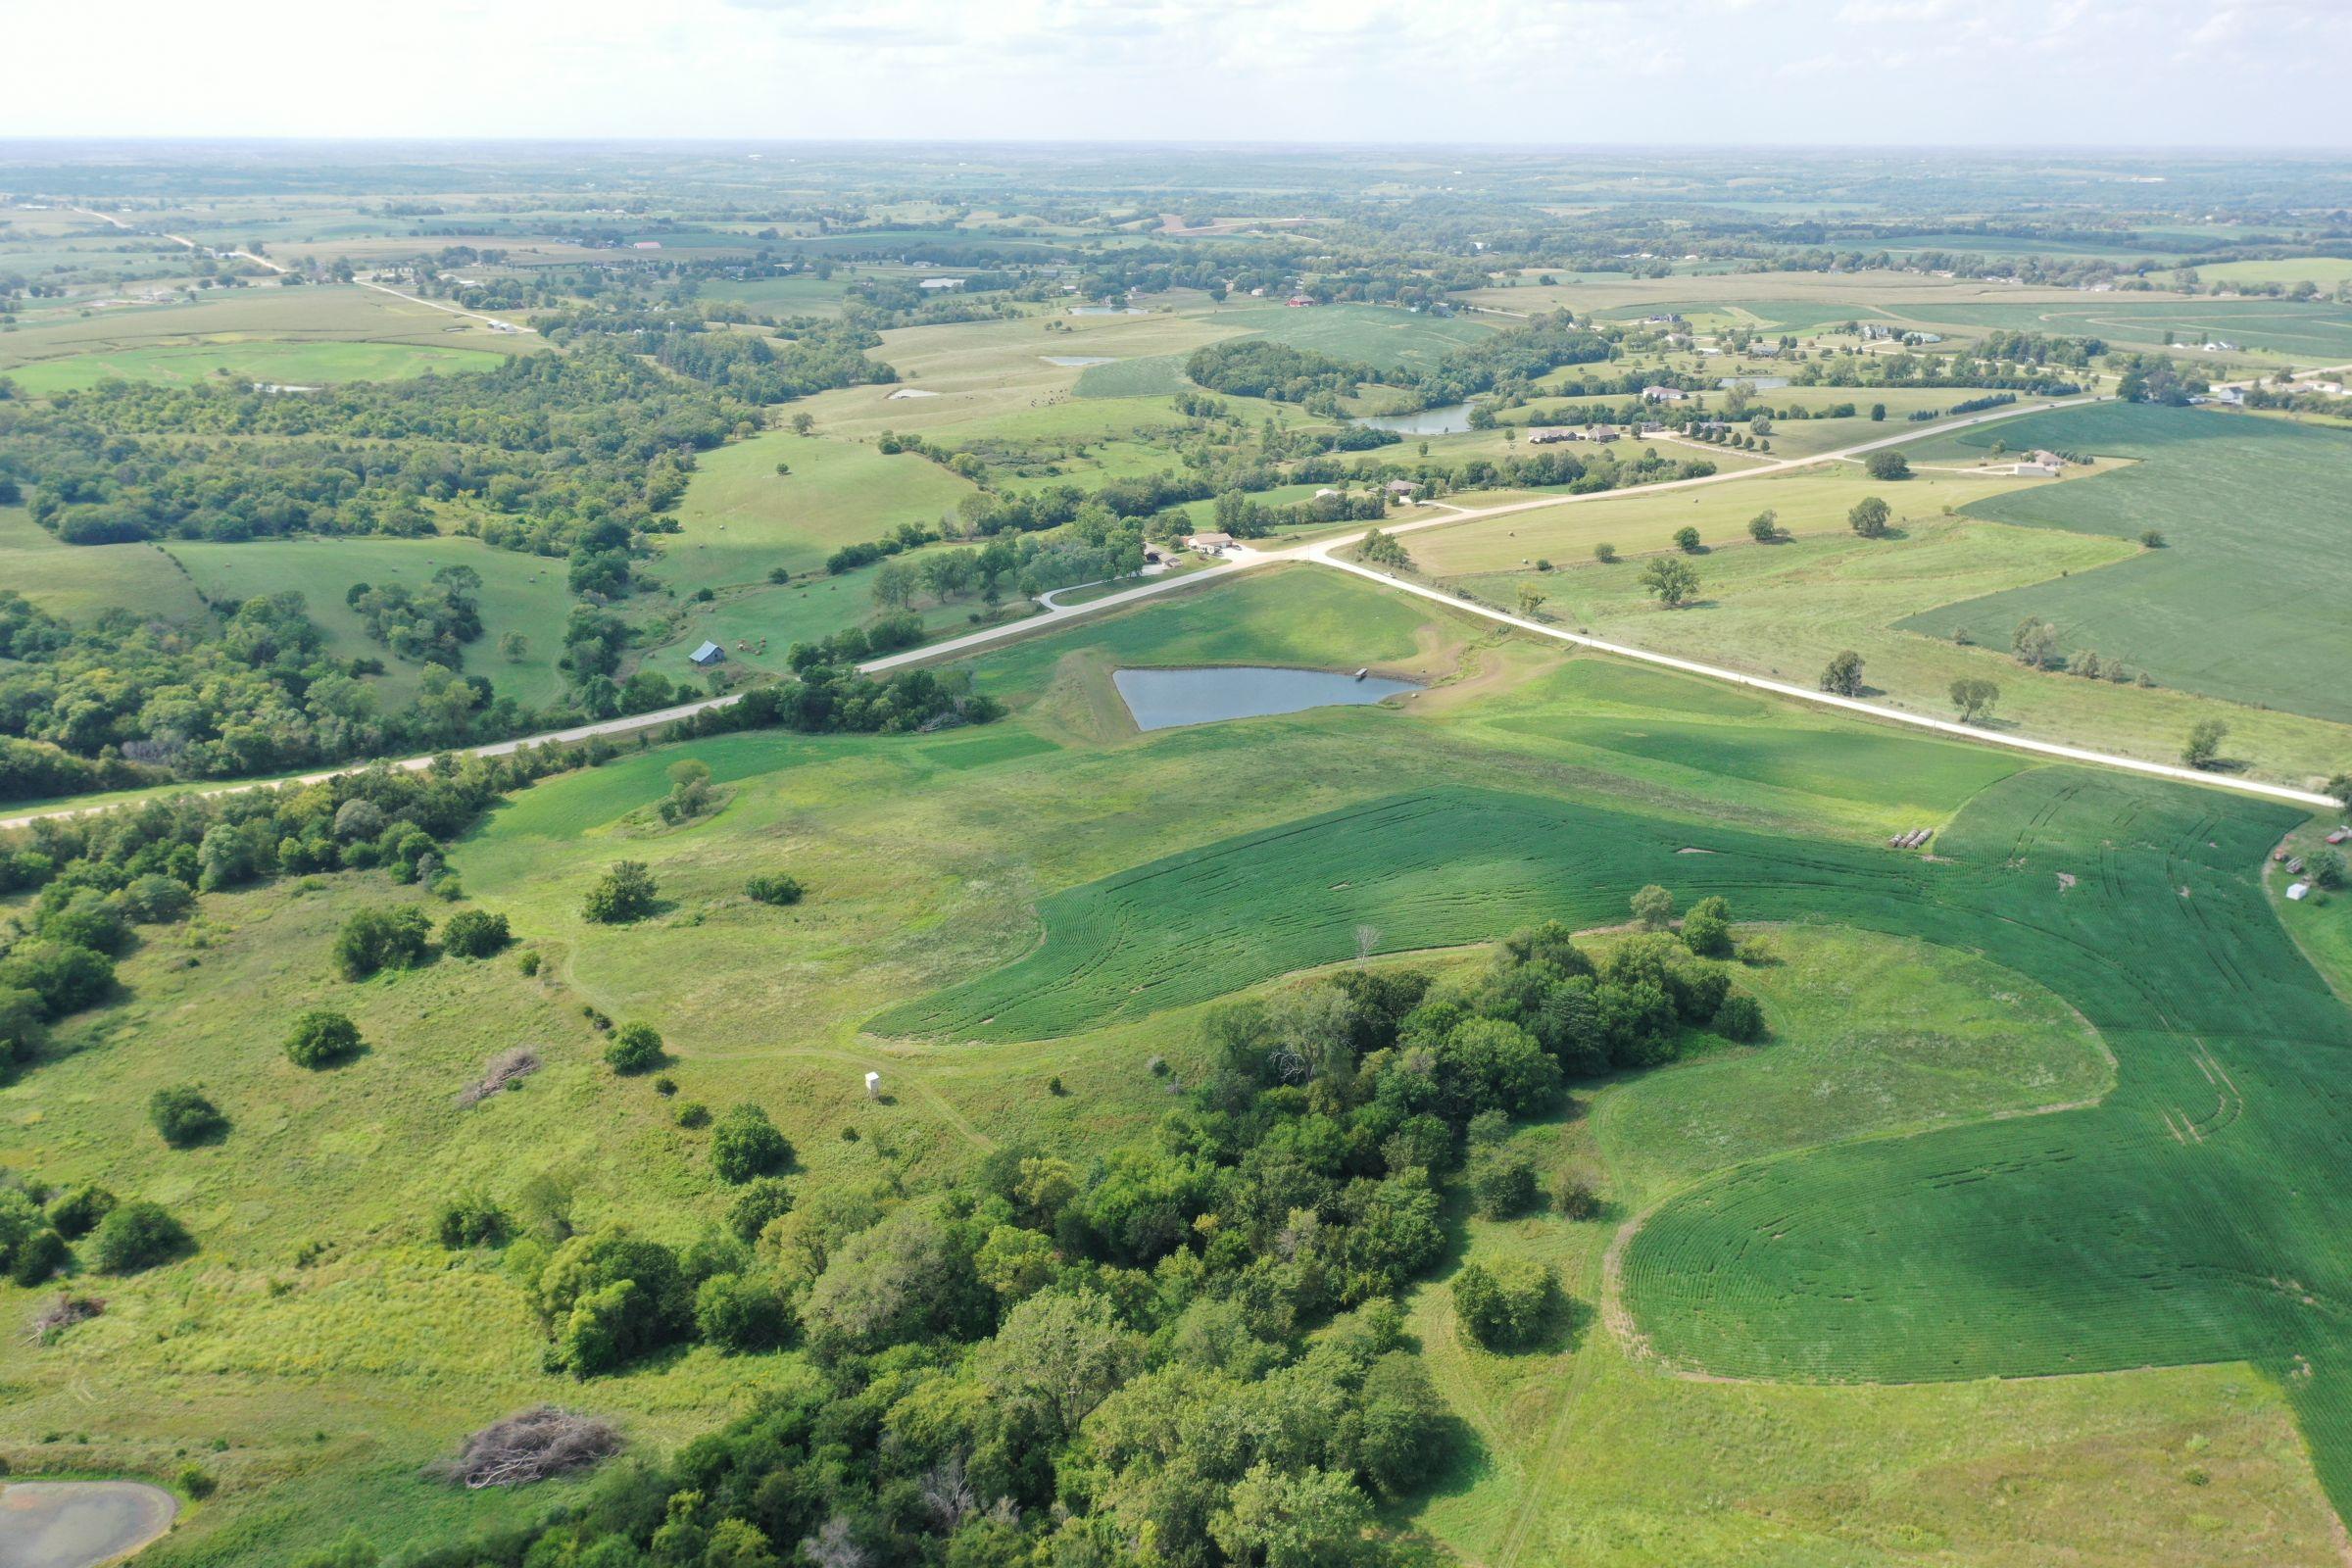 land-warren-county-iowa-12-acres-listing-number-15694-2-2021-08-20-170723.JPG